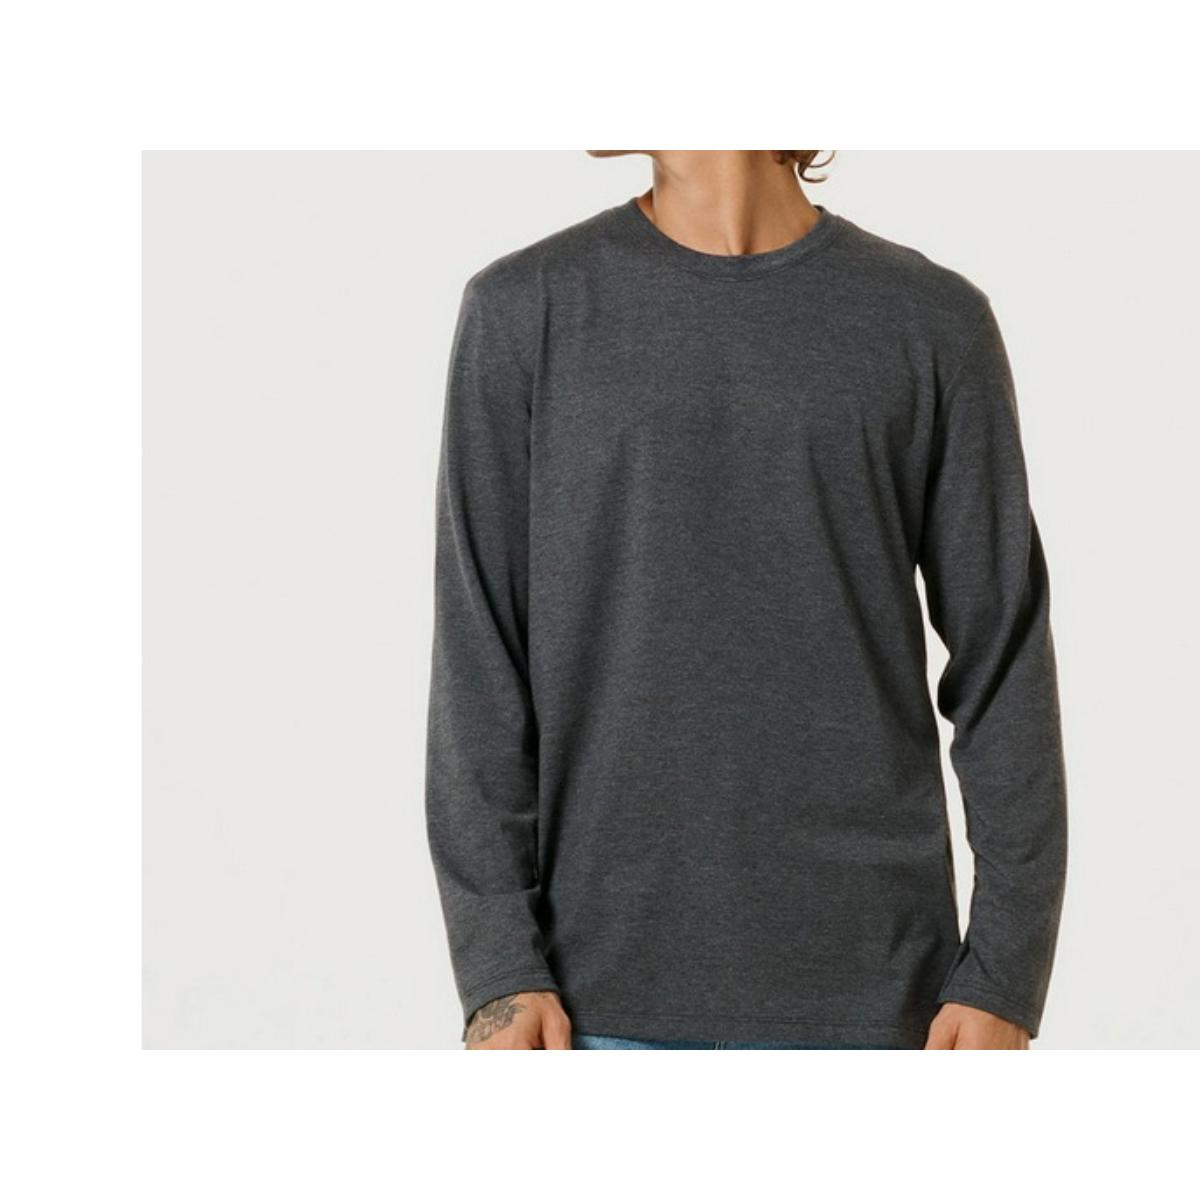 Camiseta Masculina Hering 026x Md307s Grafite